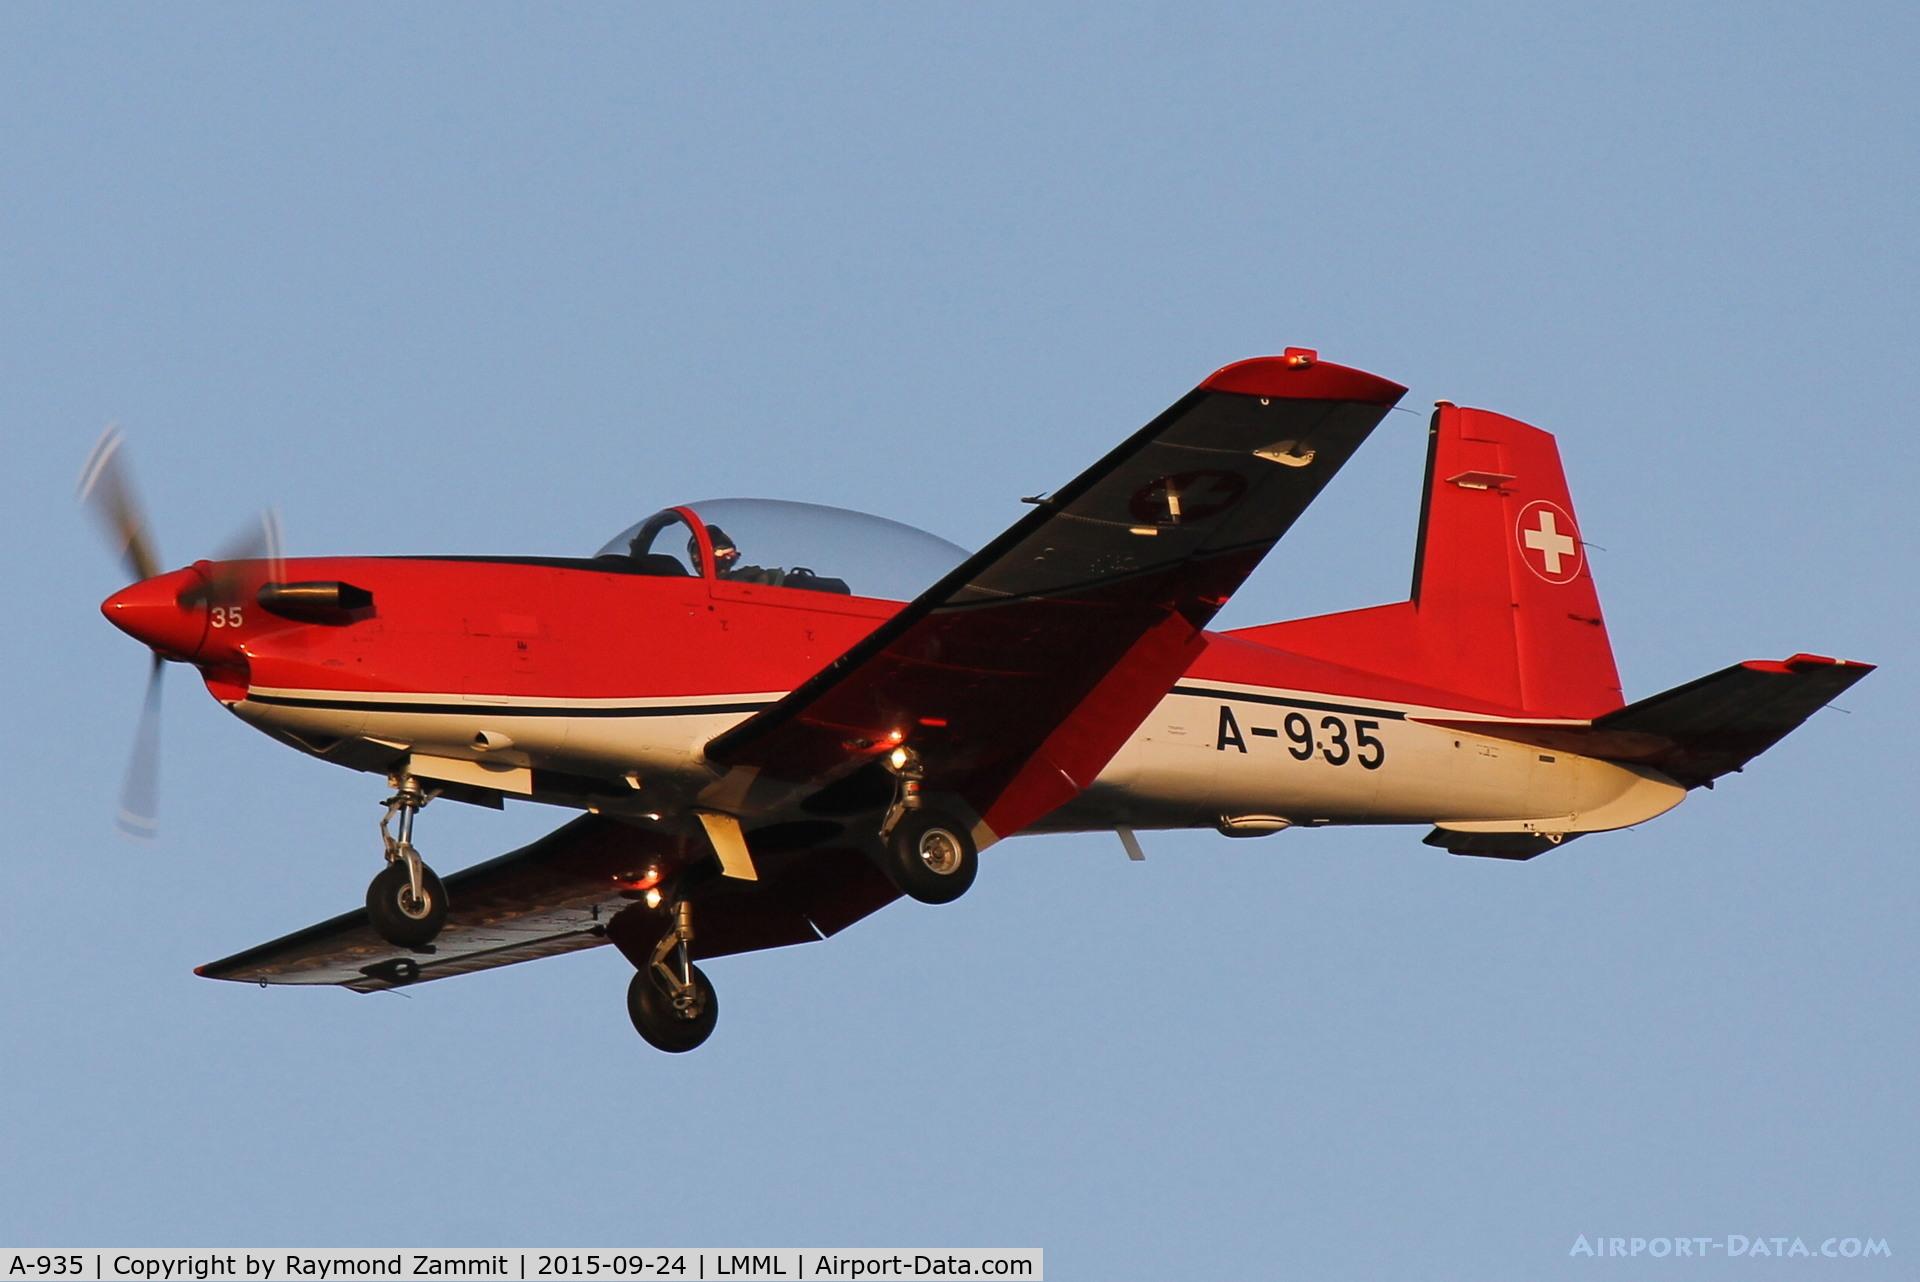 A-935, 1983 Pilatus PC-7 Turbo Trainer C/N 343, Pilatus PC-7 A-935 Swiss Air Force